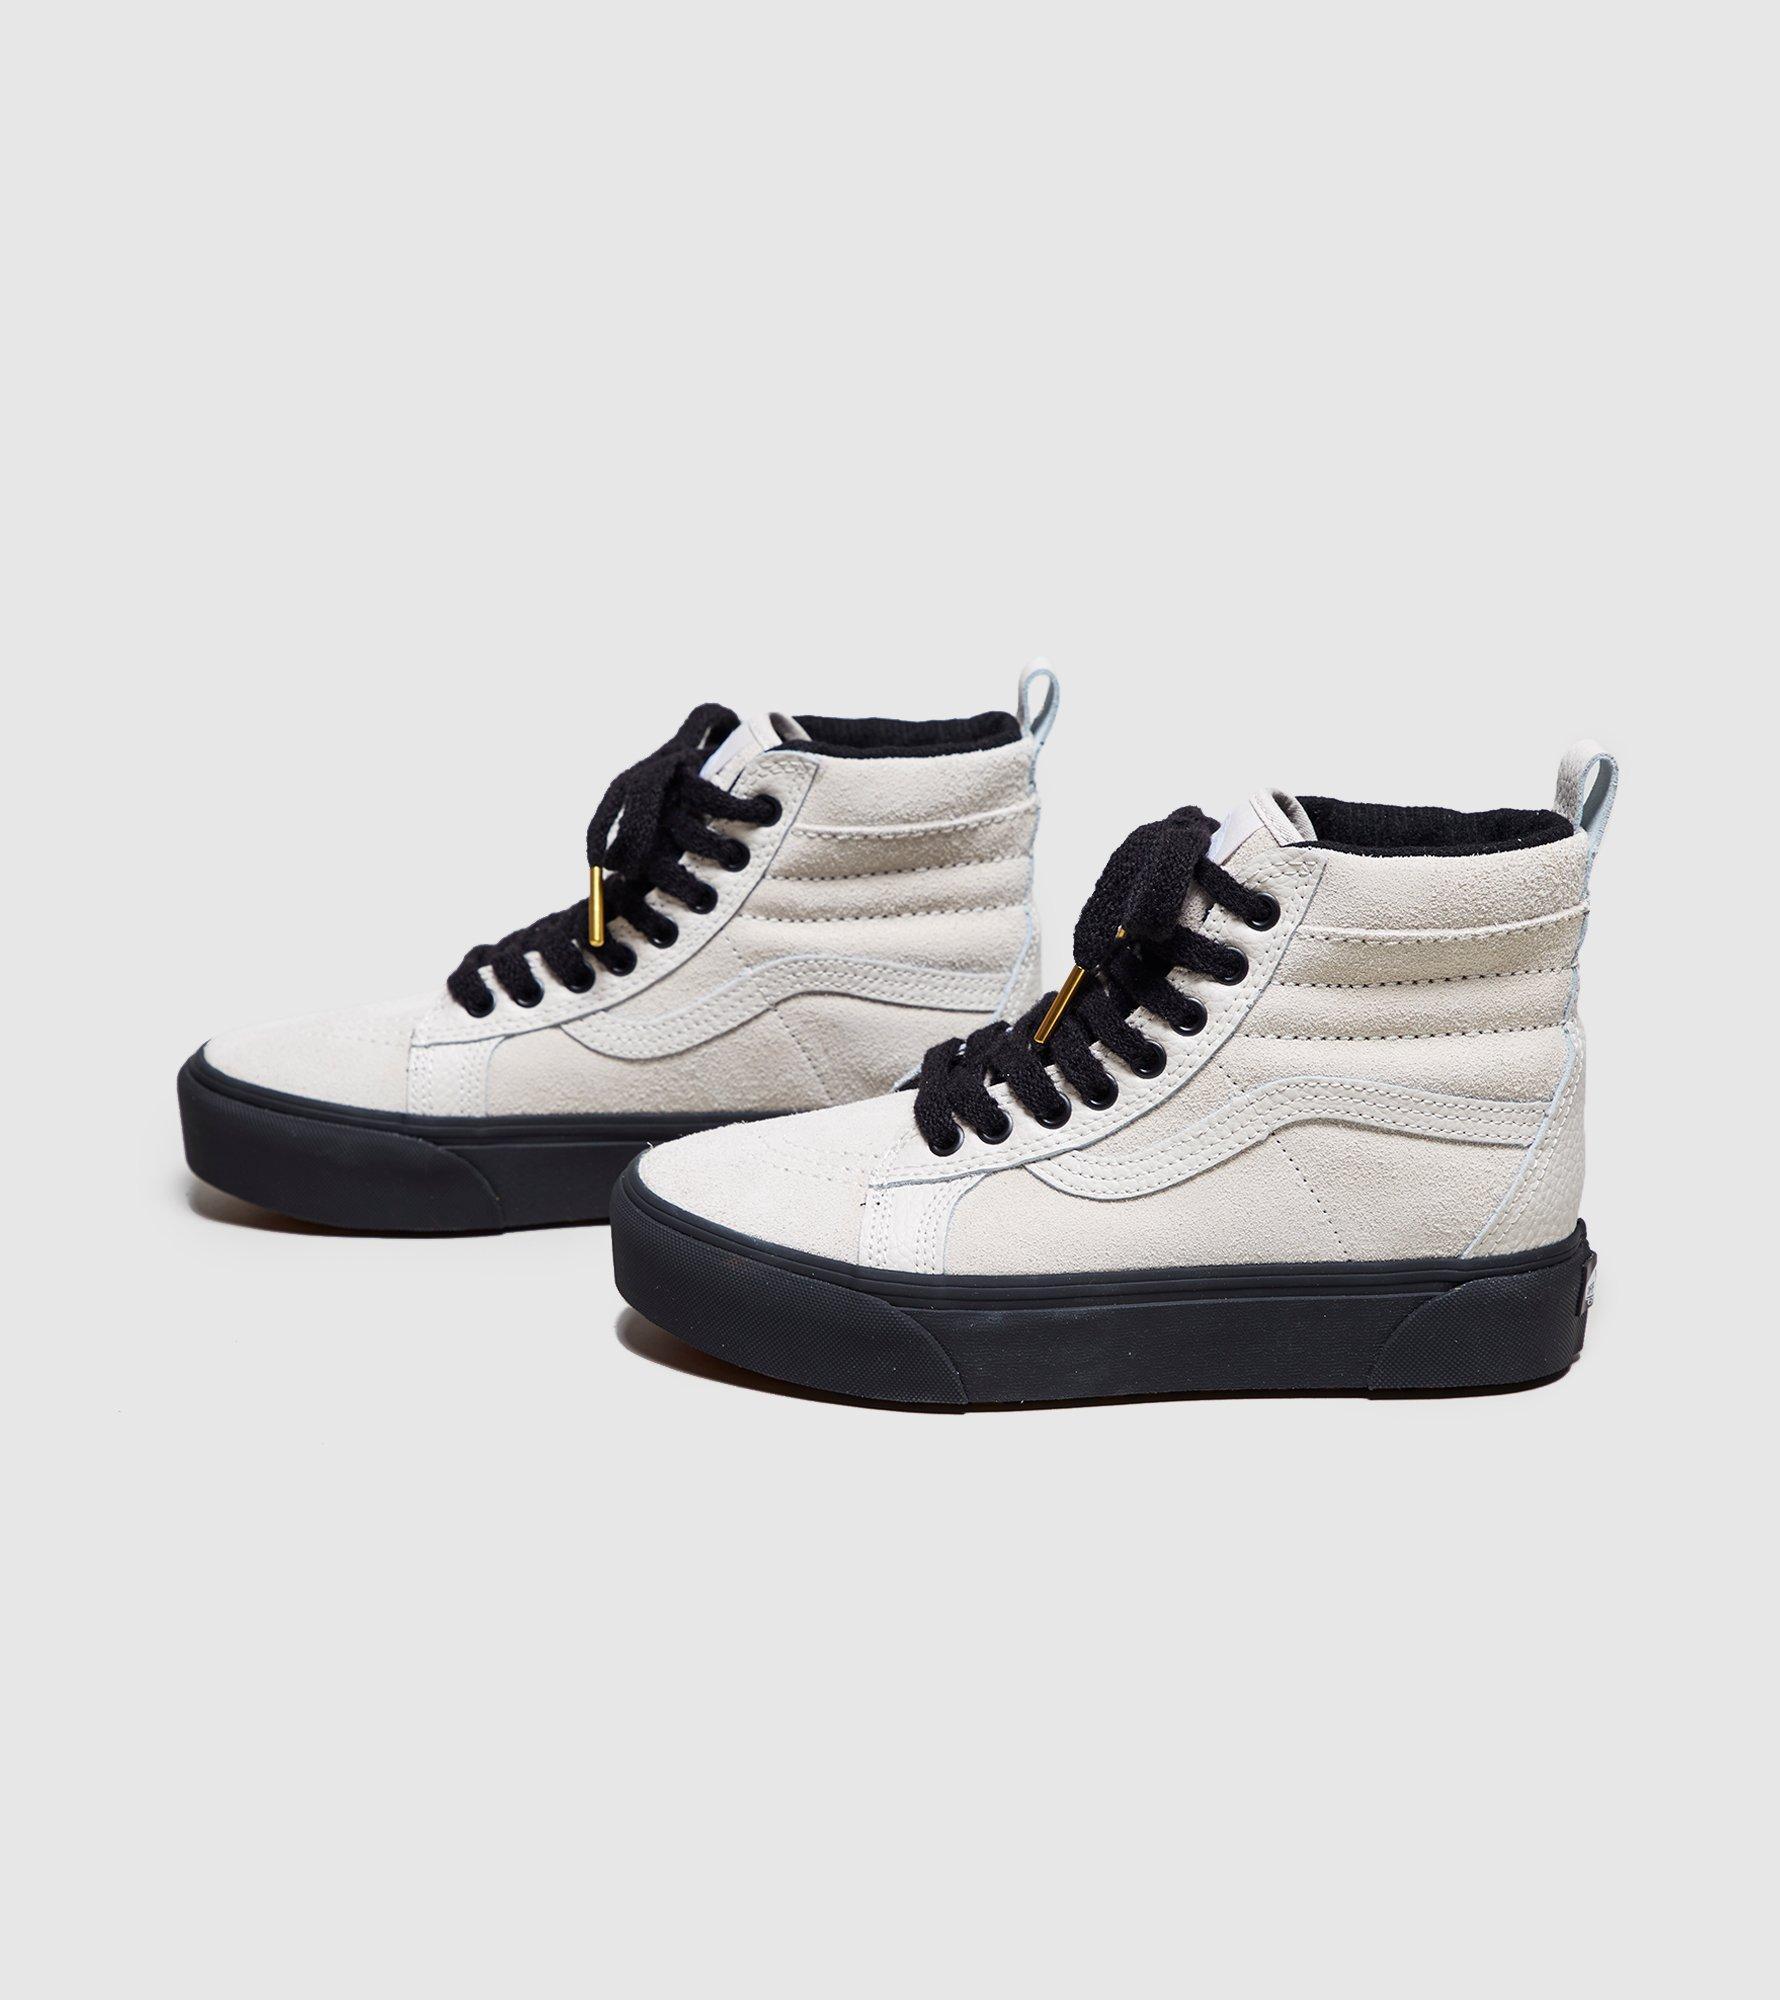 2vans white sk8 plataform